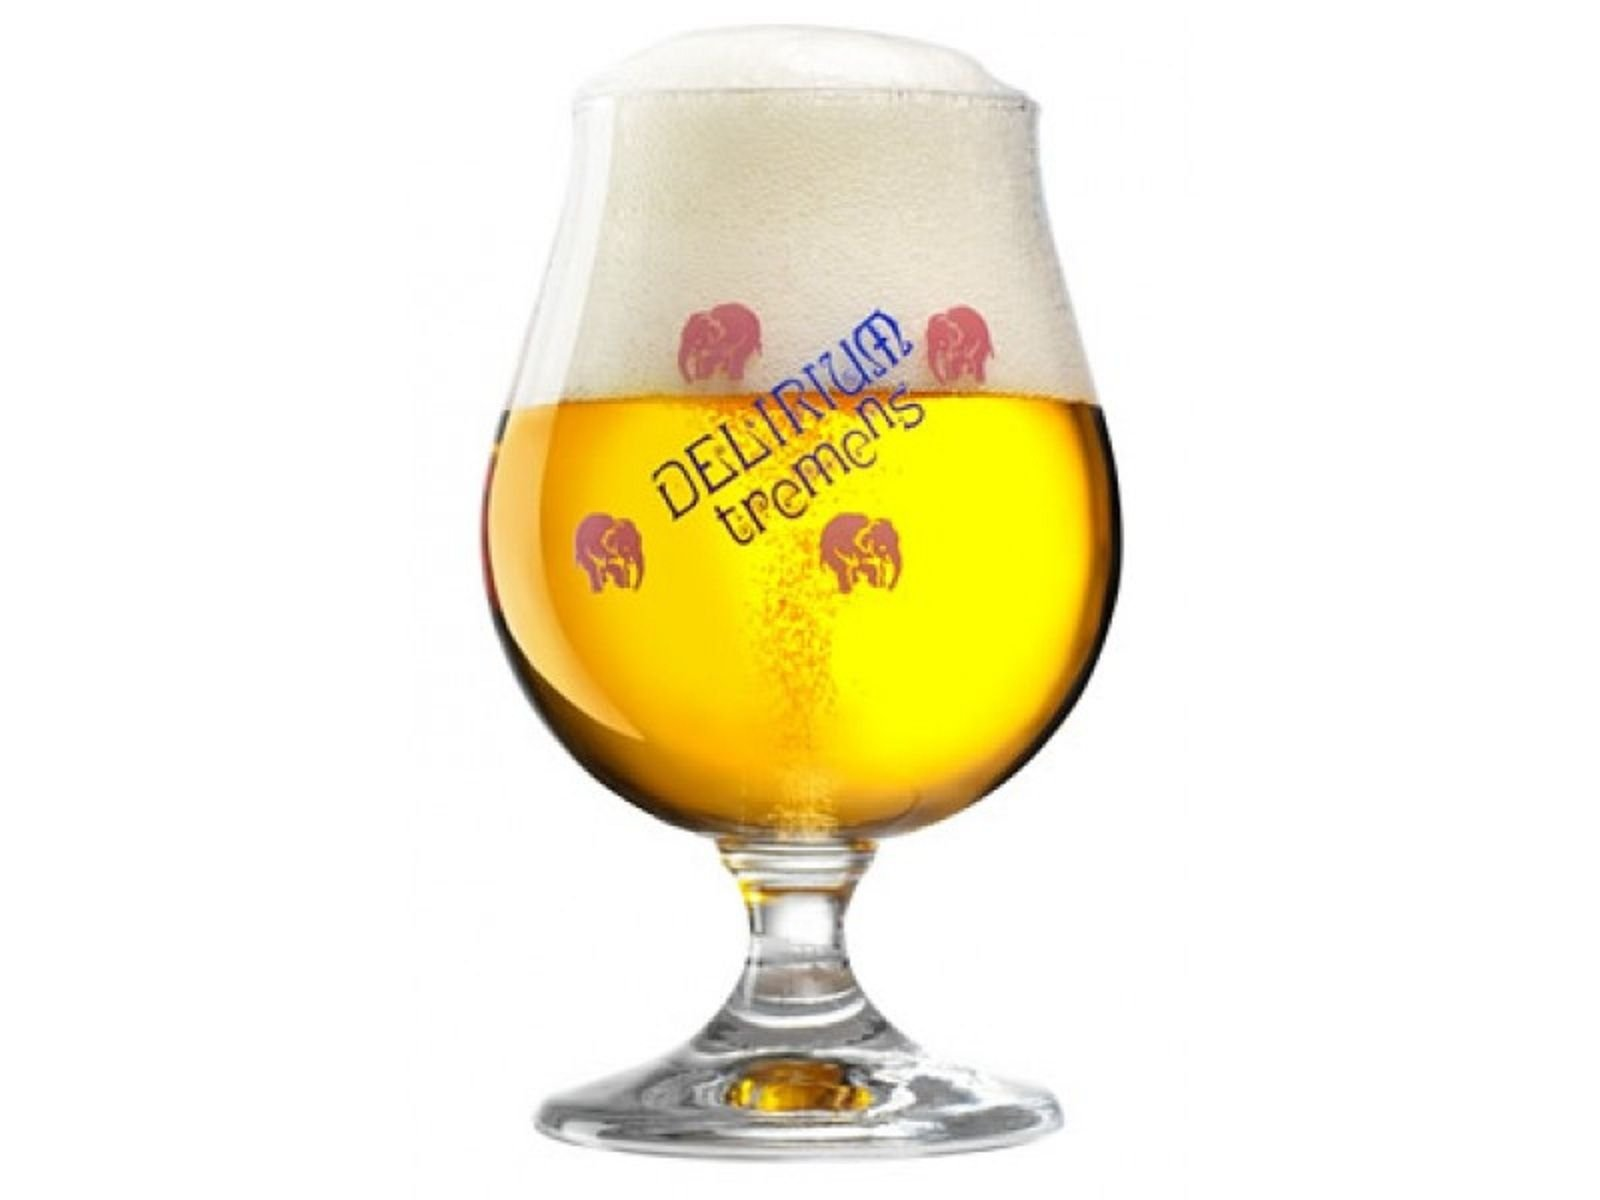 Delirium Tremens Belgian Chalice/Goblet Beer Glass 0.33L - Set of 2